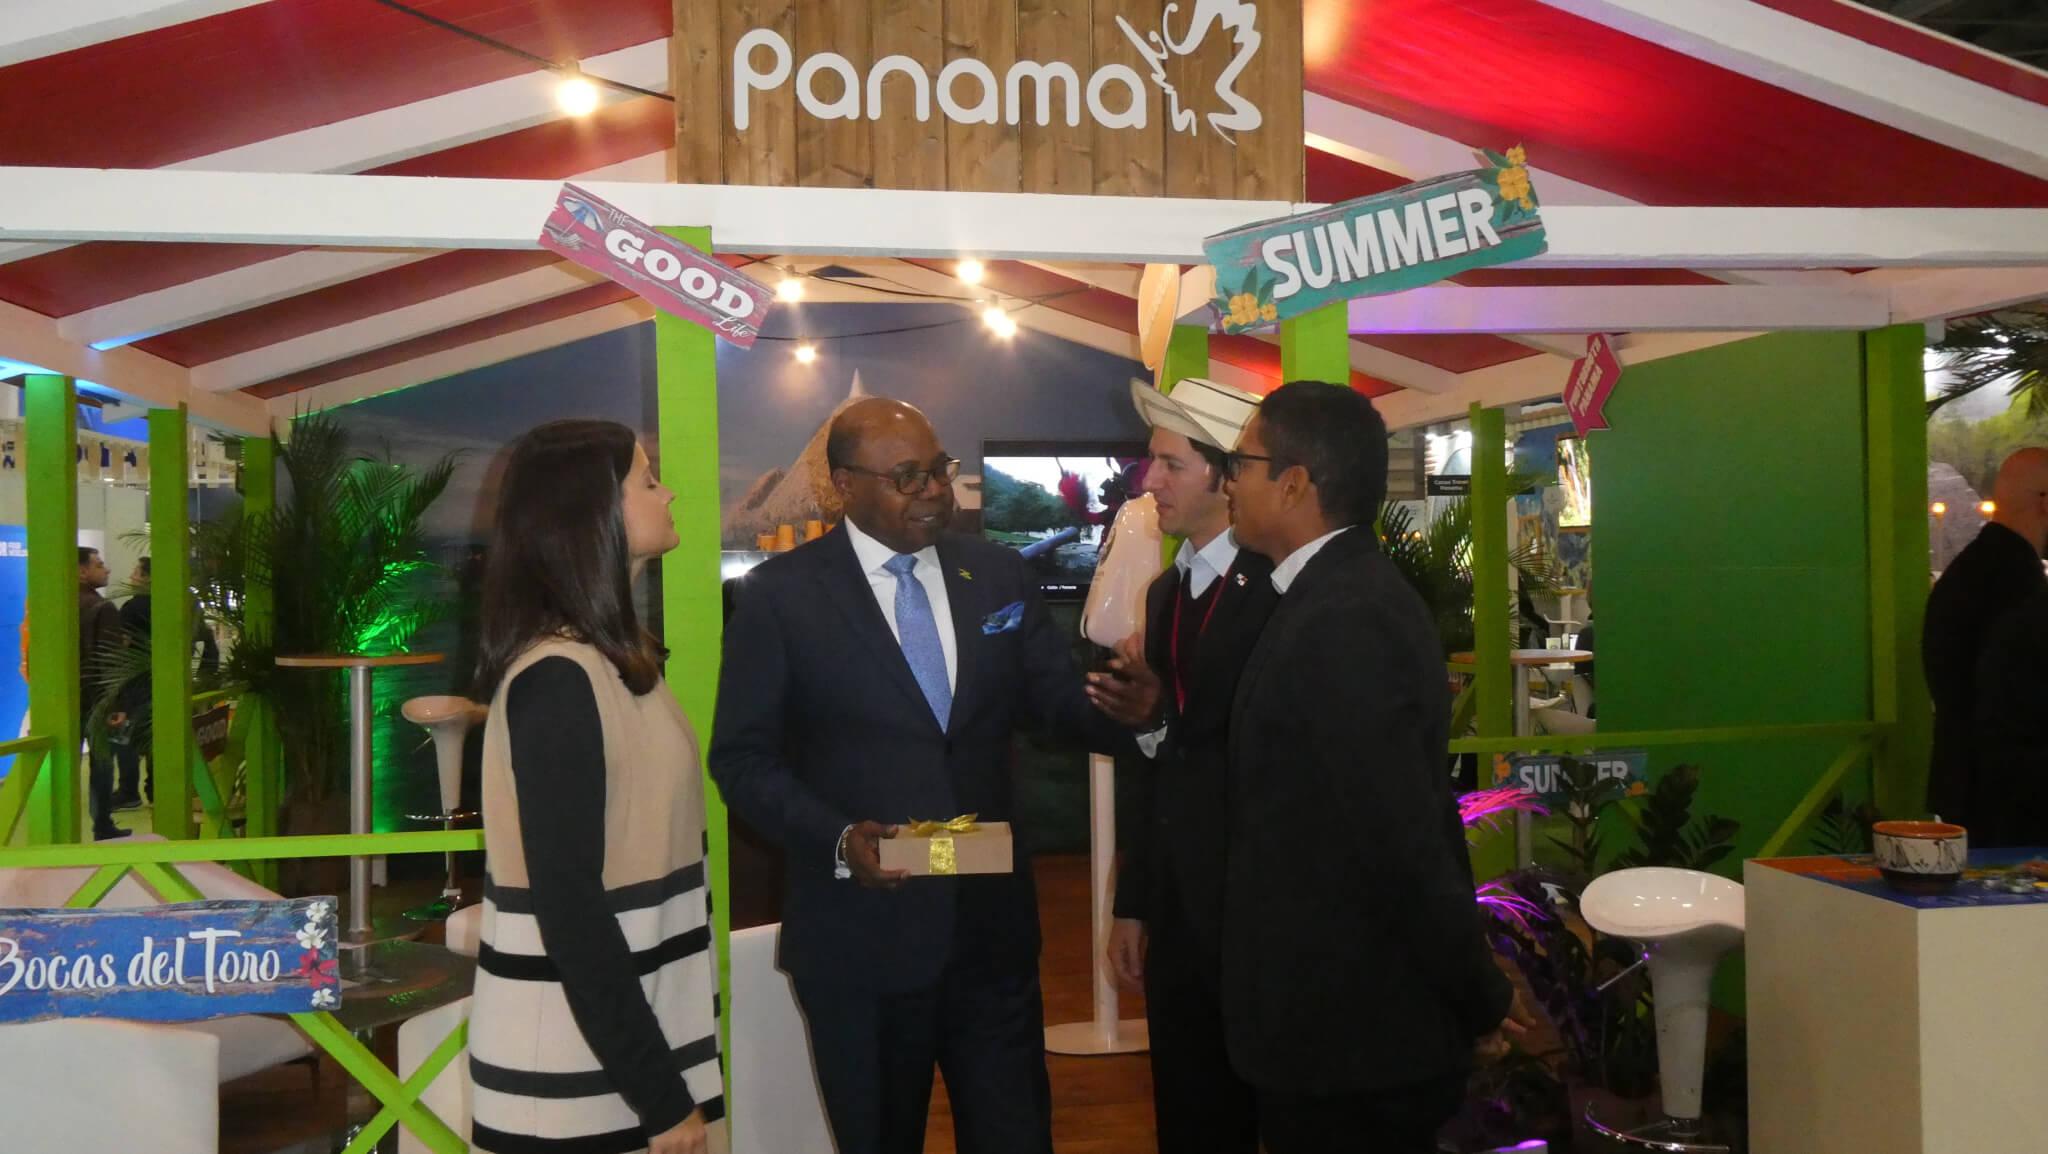 Jamaica and Panama to establish multi-destination arrangement, says Minister Bartlett